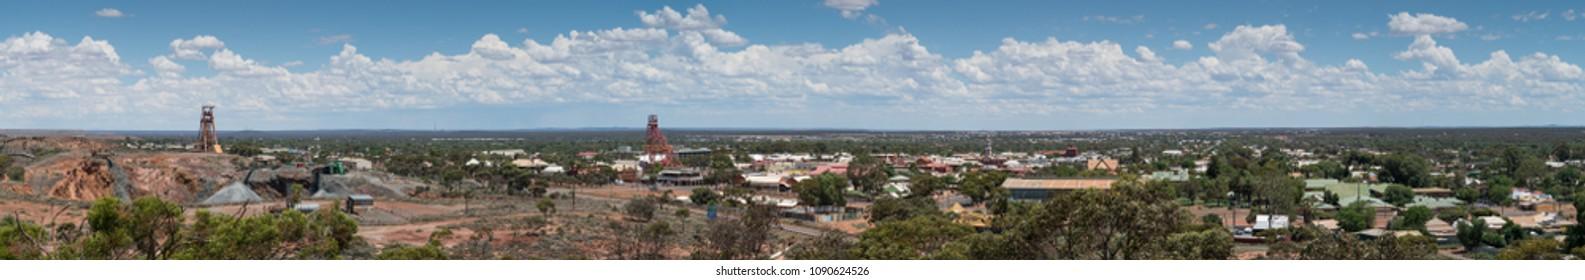 KALGOORLIE, AUSTRALIA - JANUARY 27, 2018: Panorama of the city of Kalgoorlie on January 27, 2018 in Western Australia